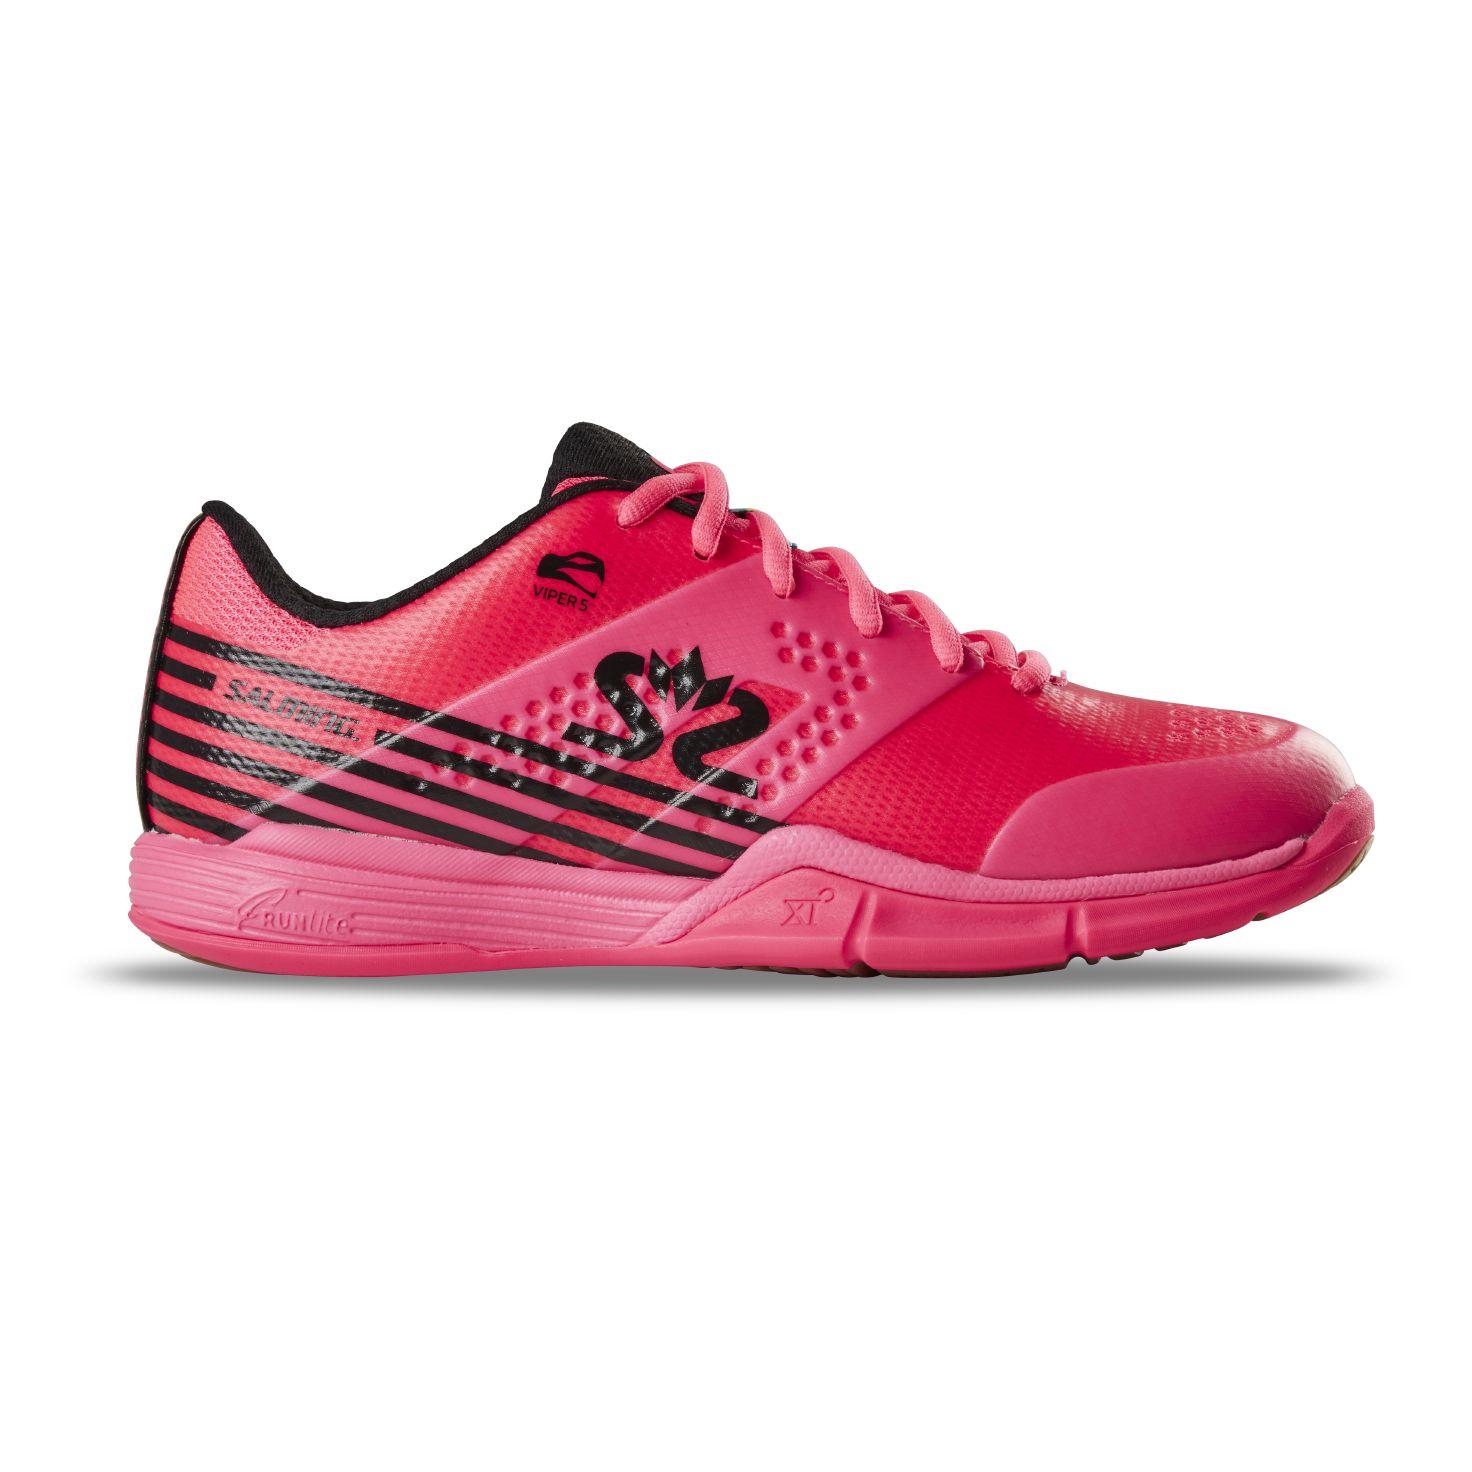 Salming Viper 5 Shoe Women Pink/Black 4 UK - 36 2/3 EUR - 23 cm